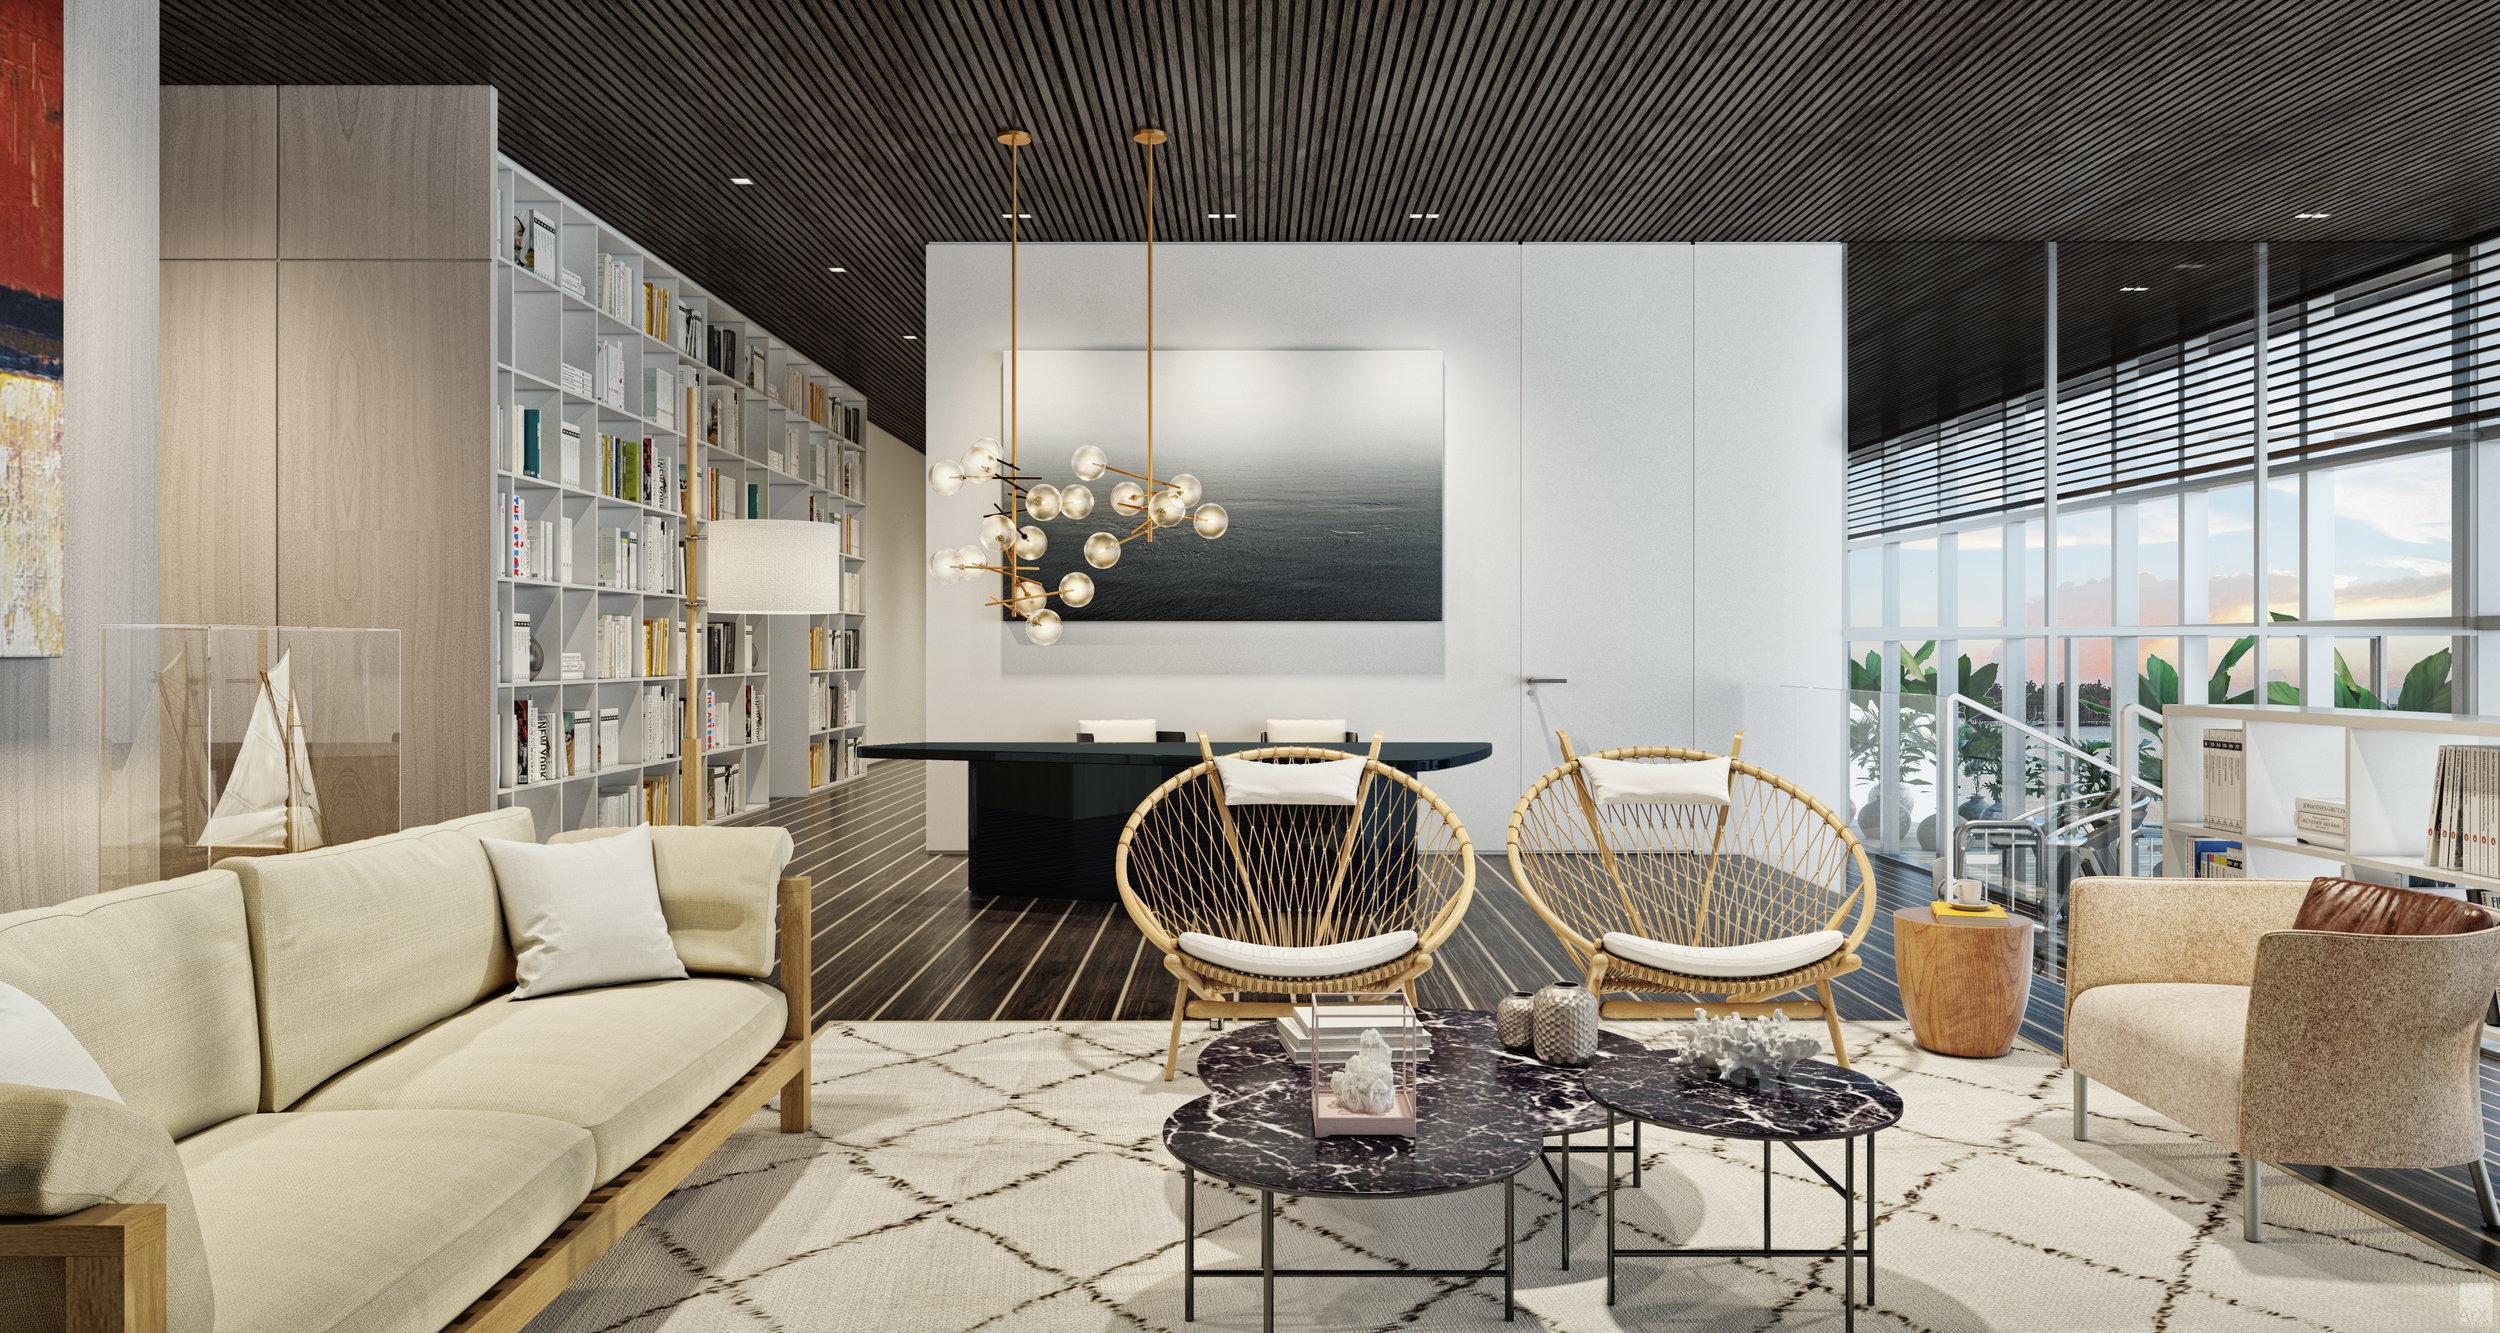 Optimum Development Launches Monaco Yacht Club & Residences With Interiors By Piero Lissoni On Miami Beach